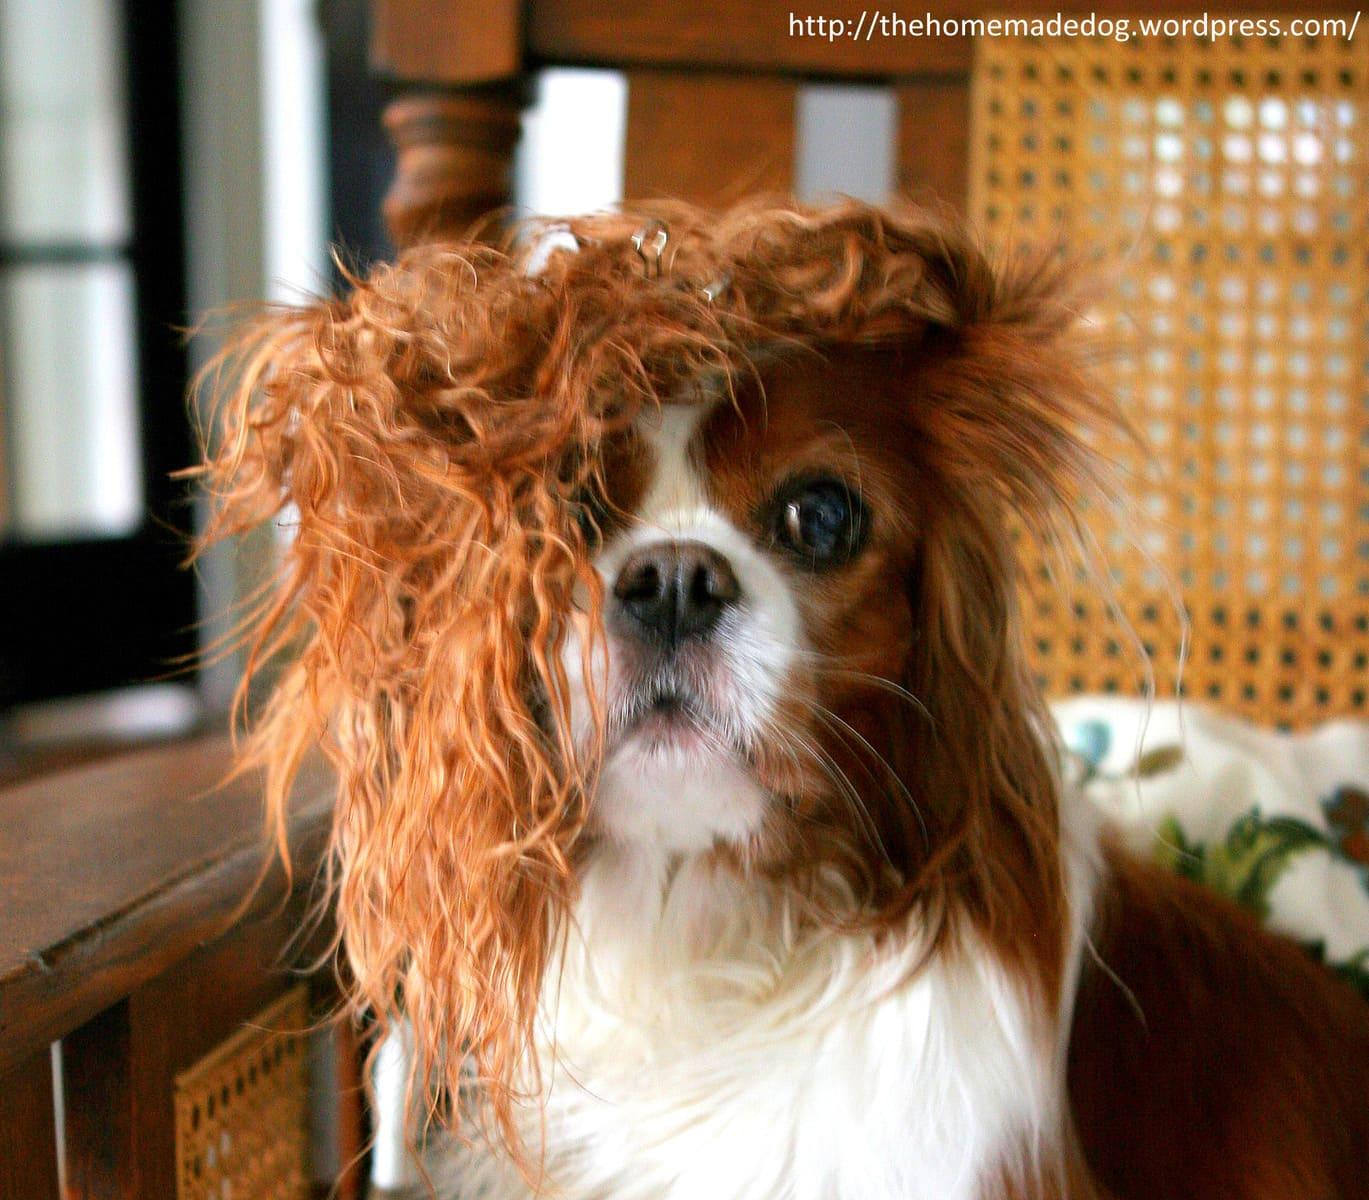 17 Dogs Having Really Bad Hair Days